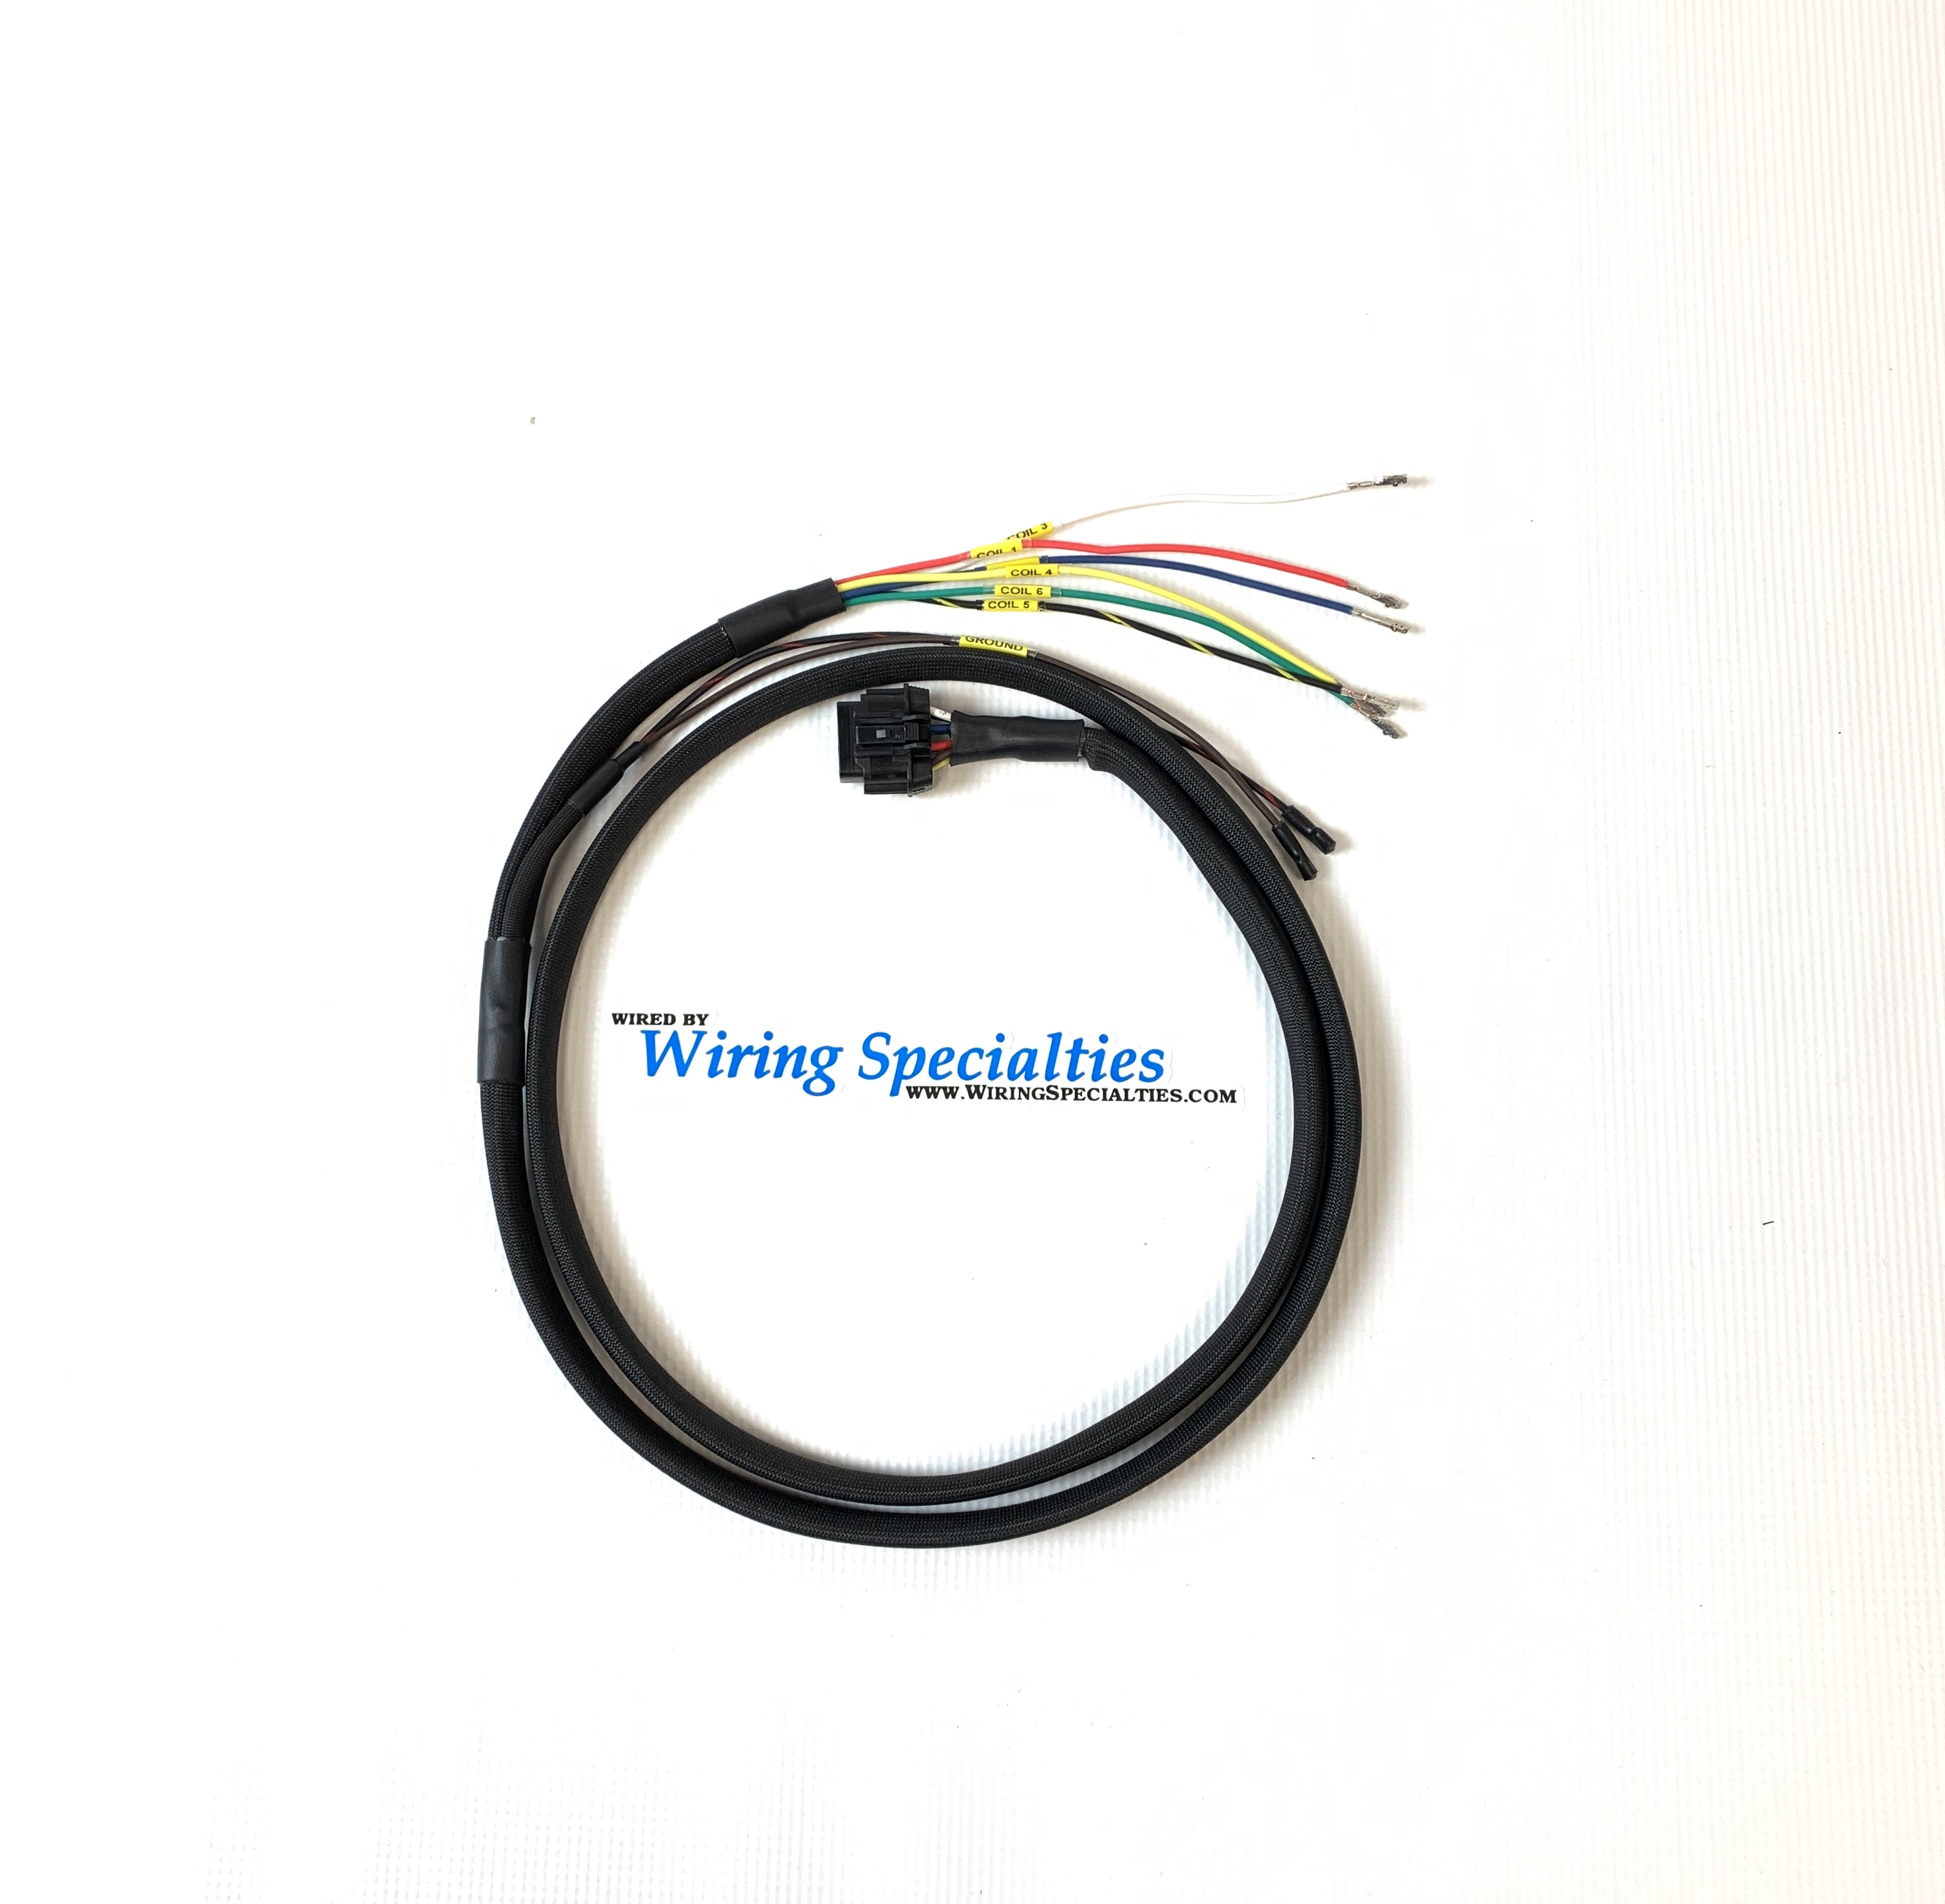 AEM A1A HO Coil Conversion Harness for 1JZGTE / 2JZGTE VVTi - Wiring  Specialties   Aem Jtec Harness Wiring      Wiring Specialties